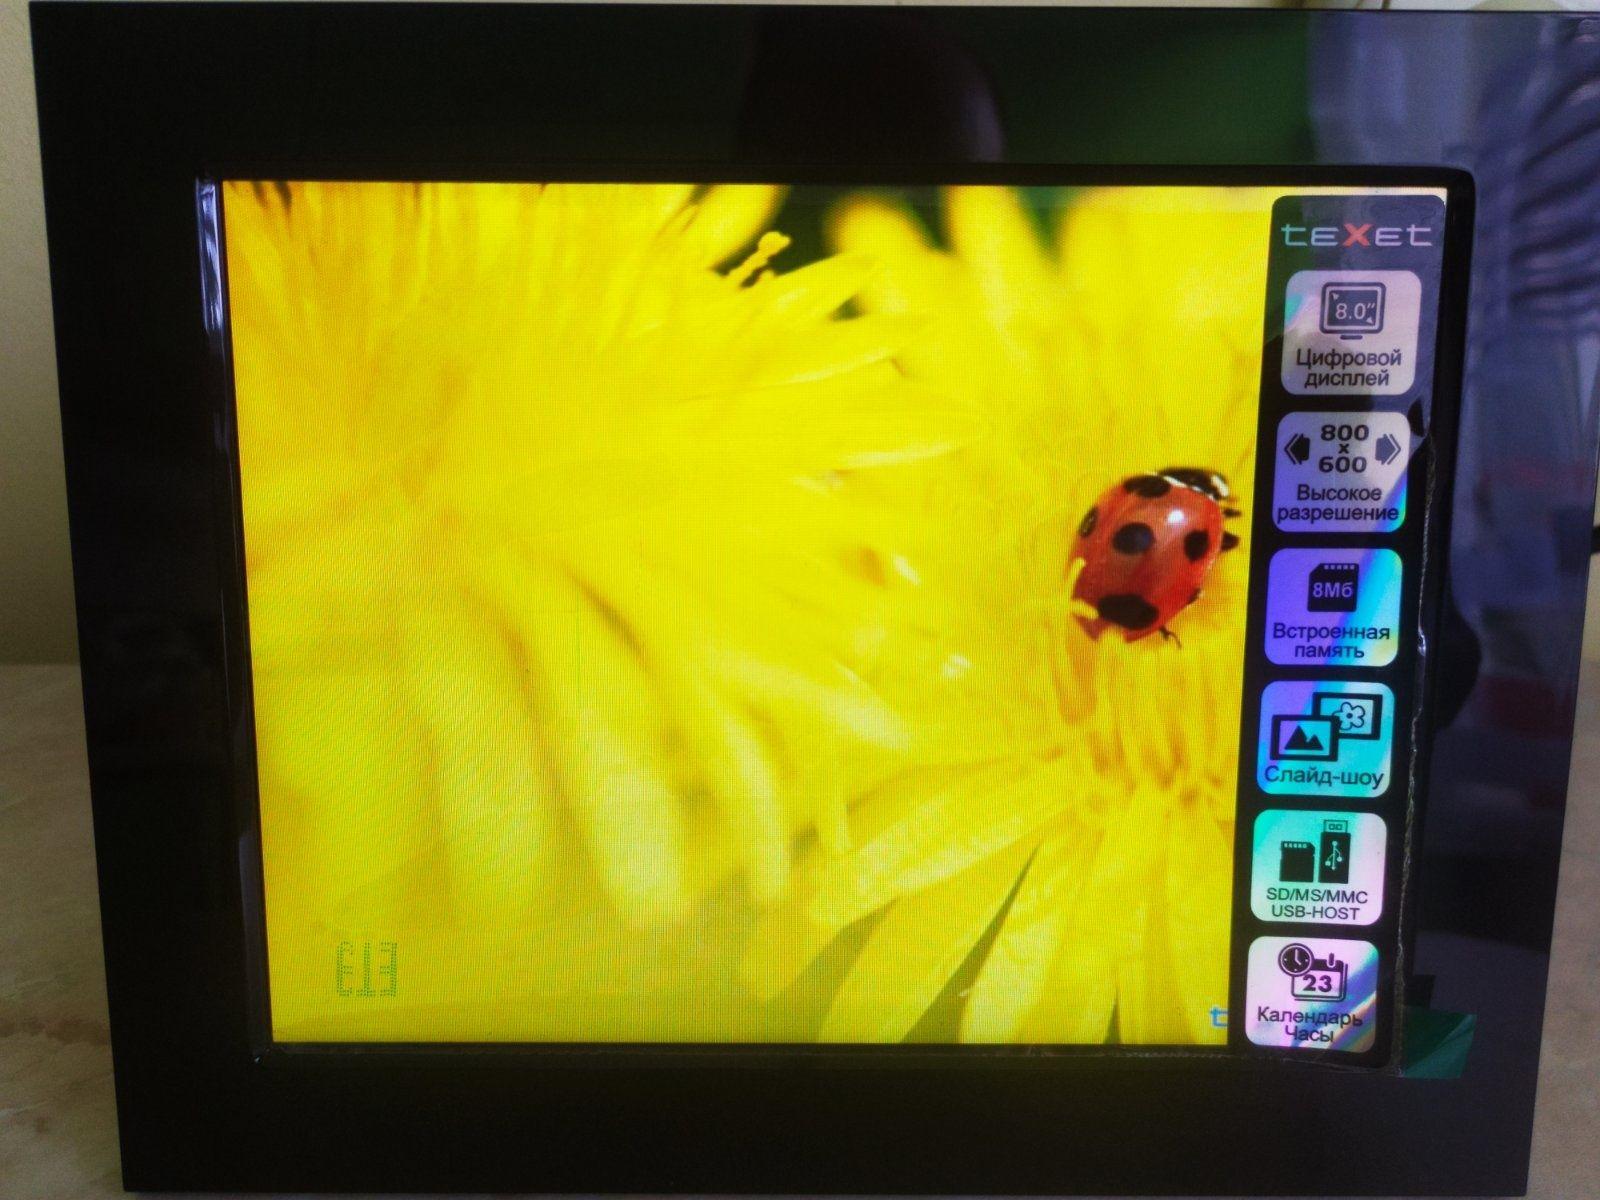 Цифровая фоторамка Texet TF-308  новая.